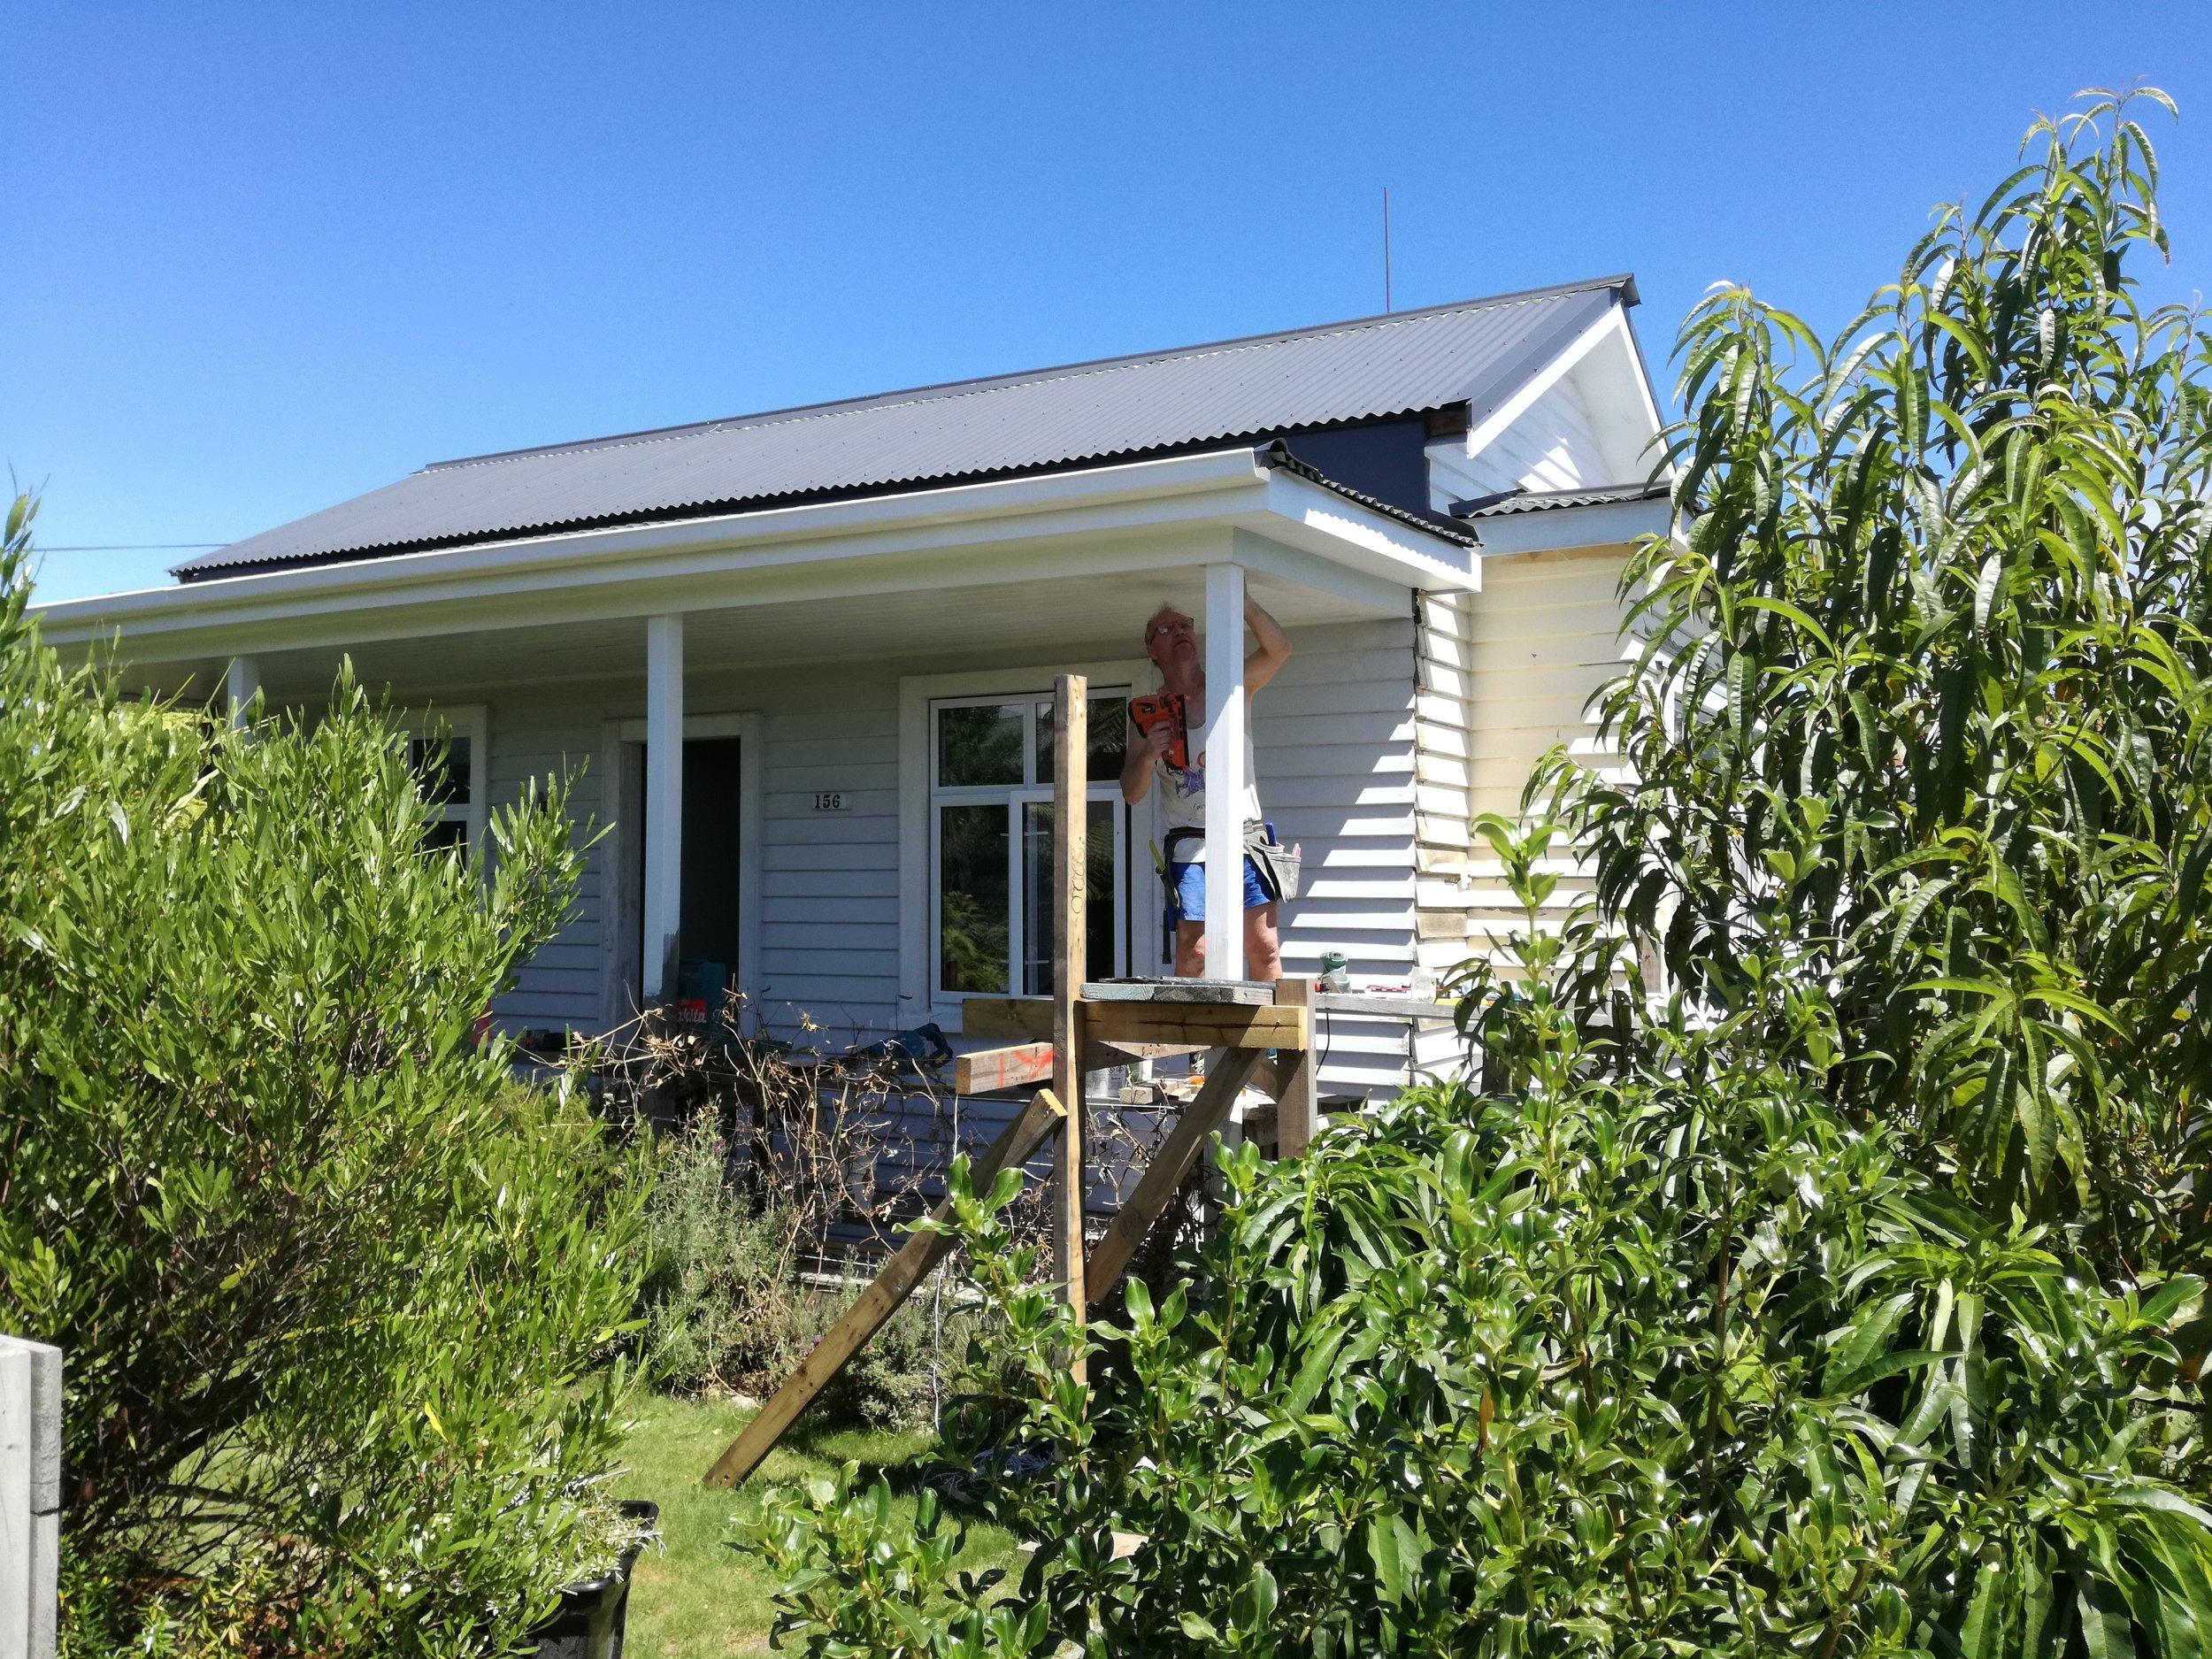 House Renovation & Upgrade